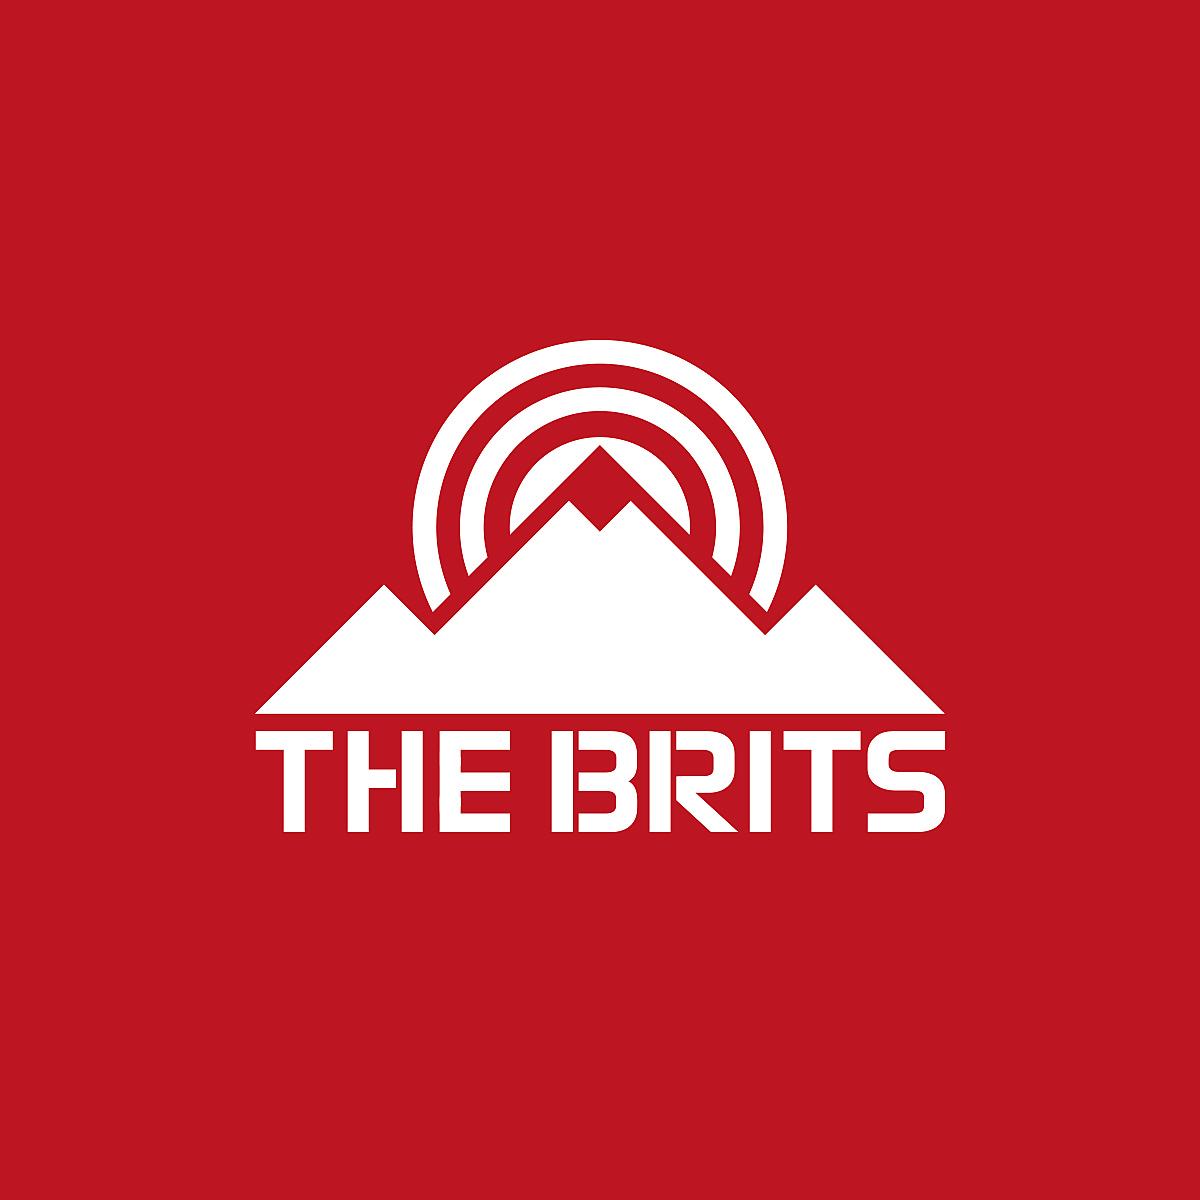 The Brits Branding 6